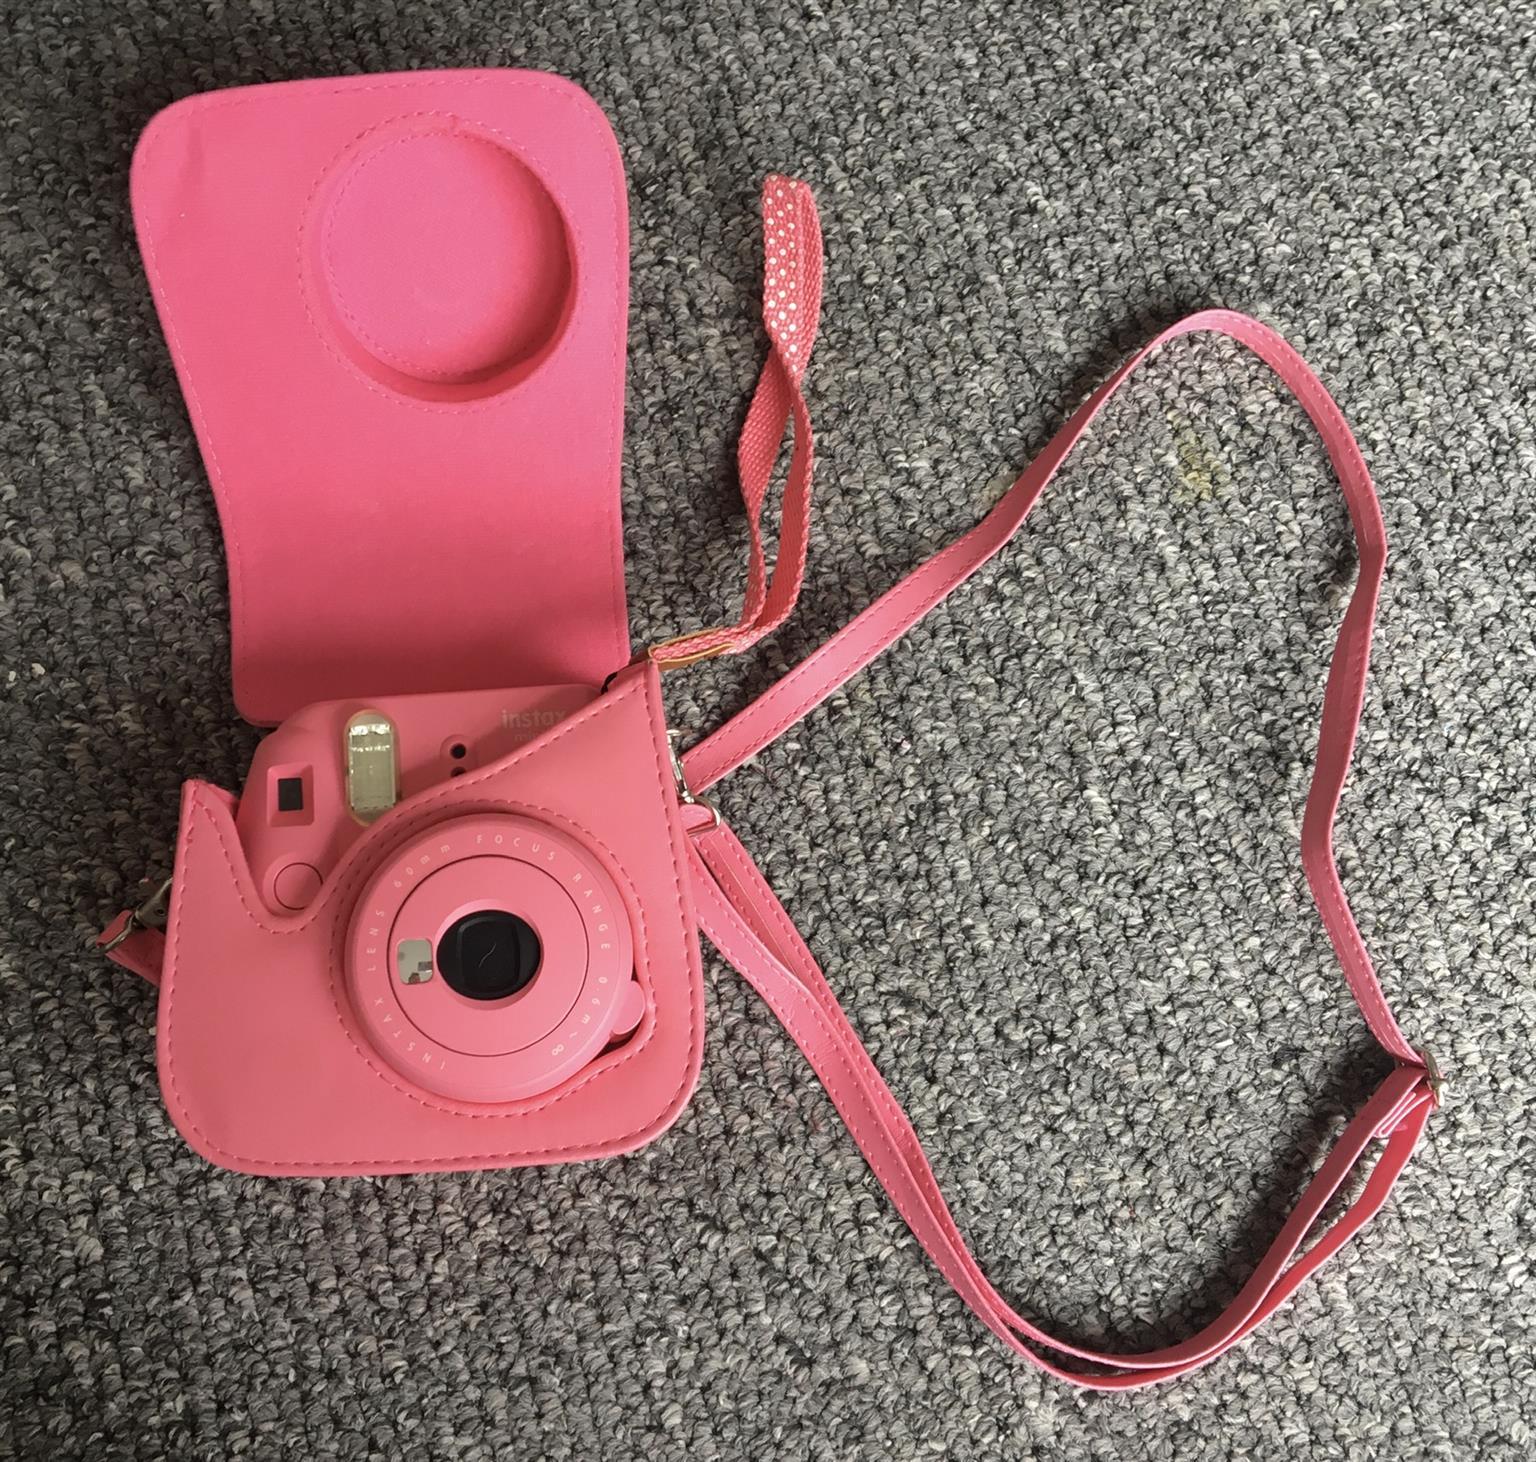 Fujifilm instax mini 9 camera set for sale in immaculate condition!!